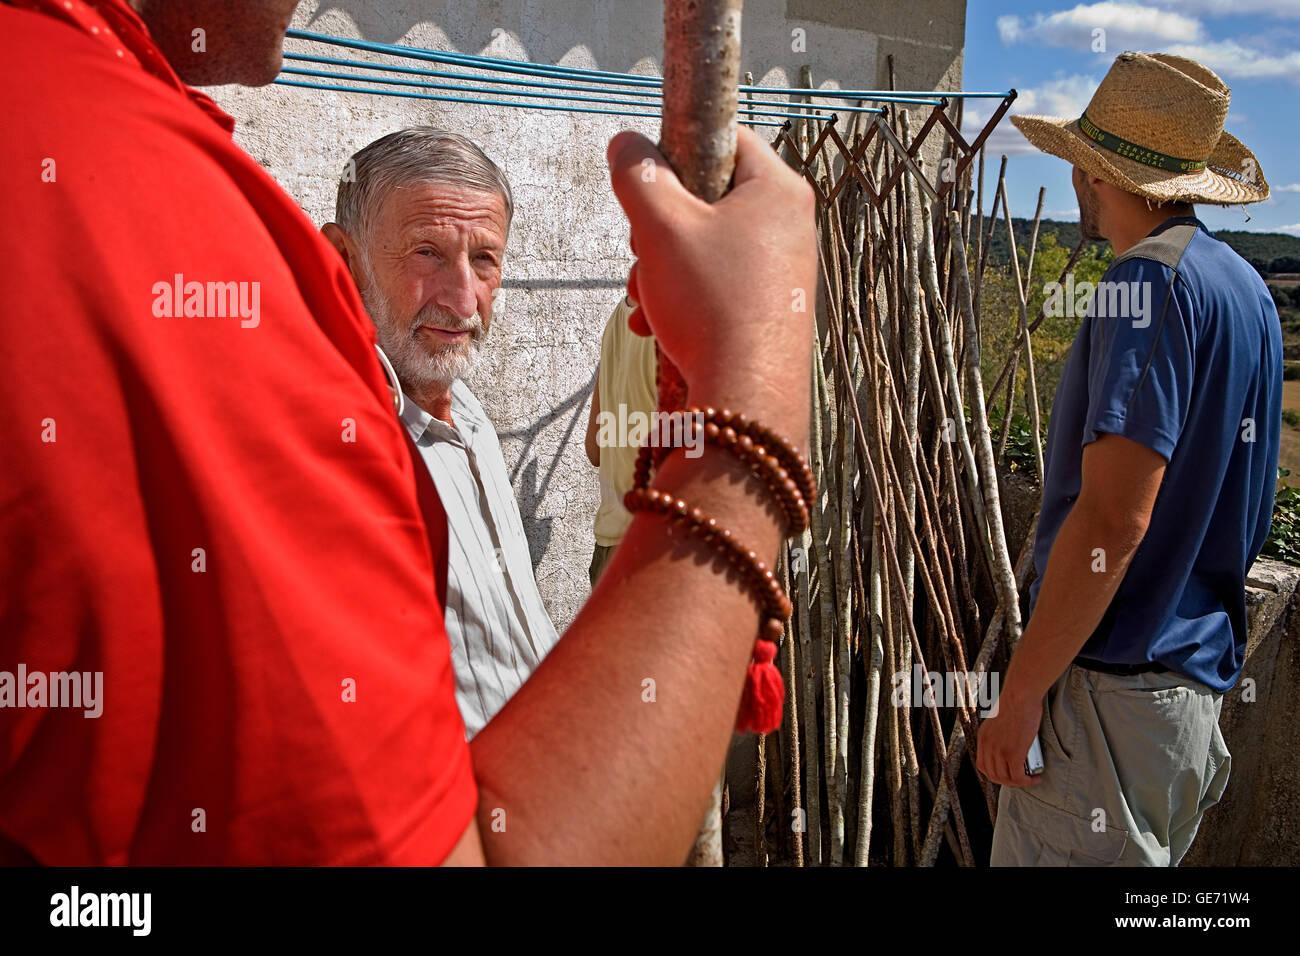 Pablo Sanz (Pablito) makes canes for the pilgrims (free-altruistic) . Azketa. Navarra. Spain. Camino de Santiago - Stock Image